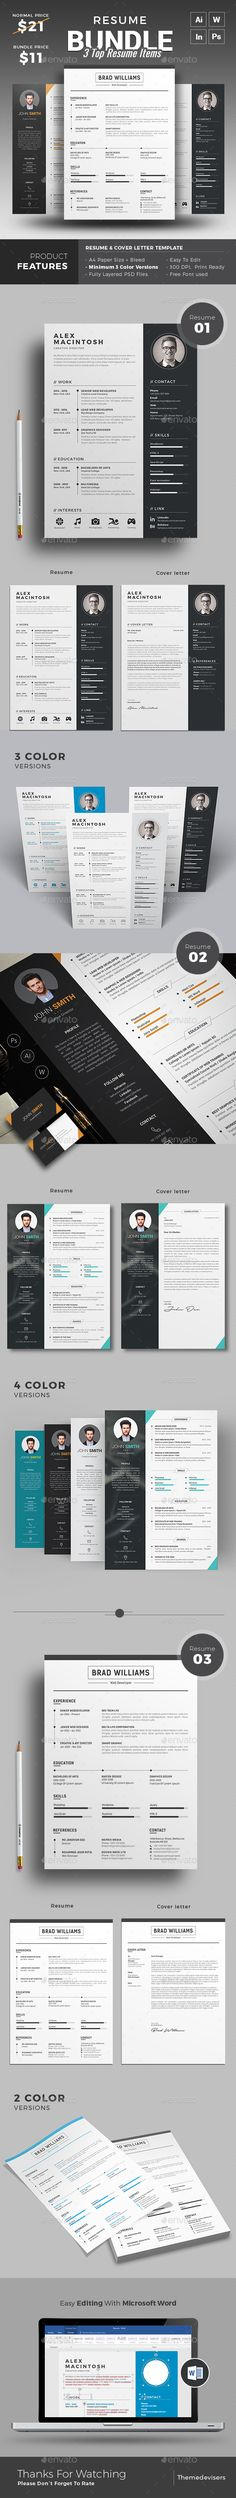 Free Professional Resume CV Template Free PSD Design Portafolio